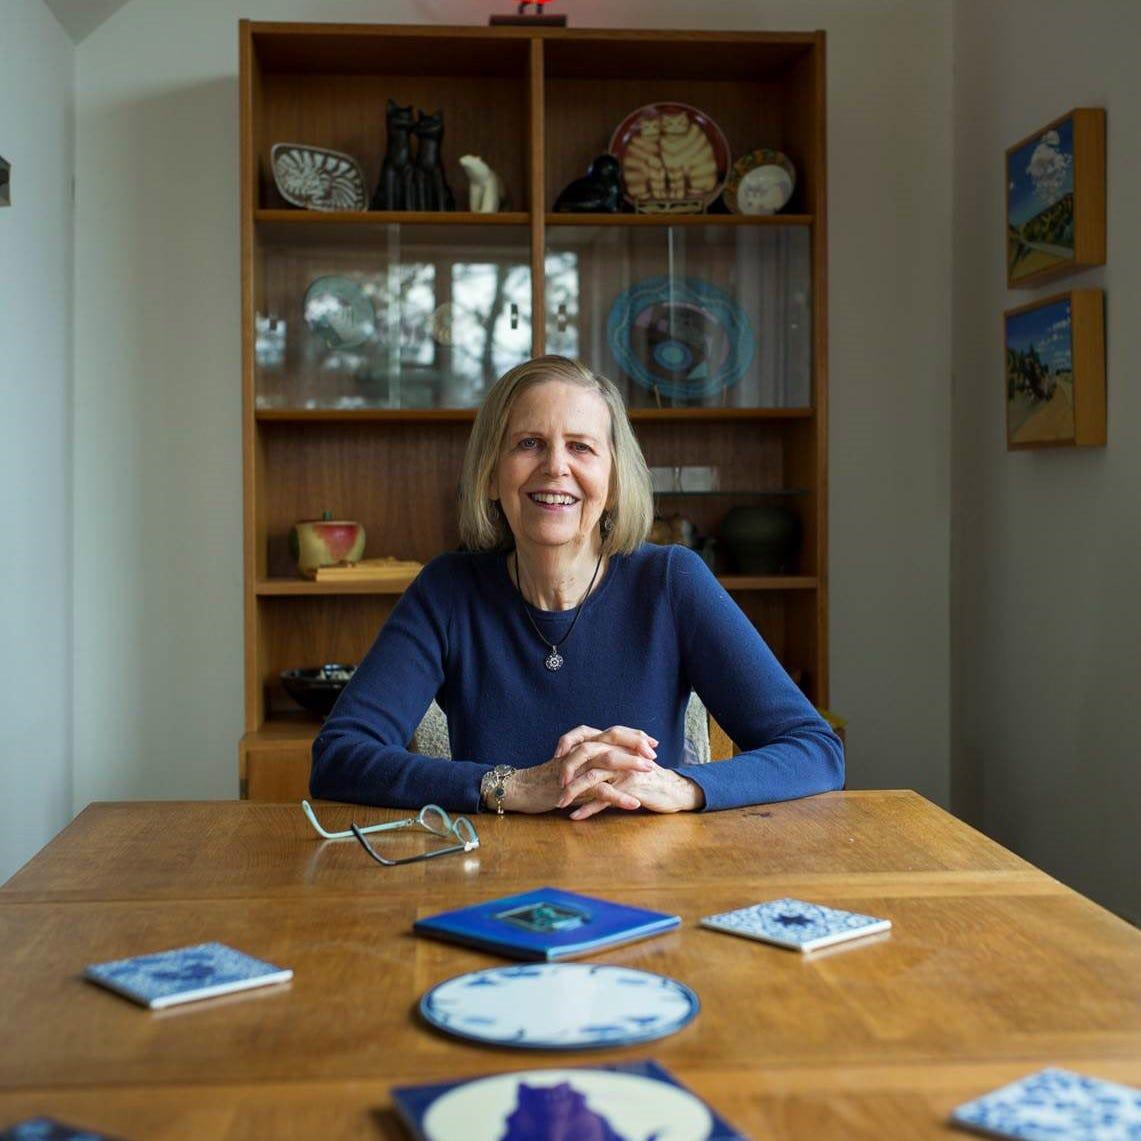 Asheville's Malaprop's welcomes 'Patchwork' author Bobbie Ann Mason